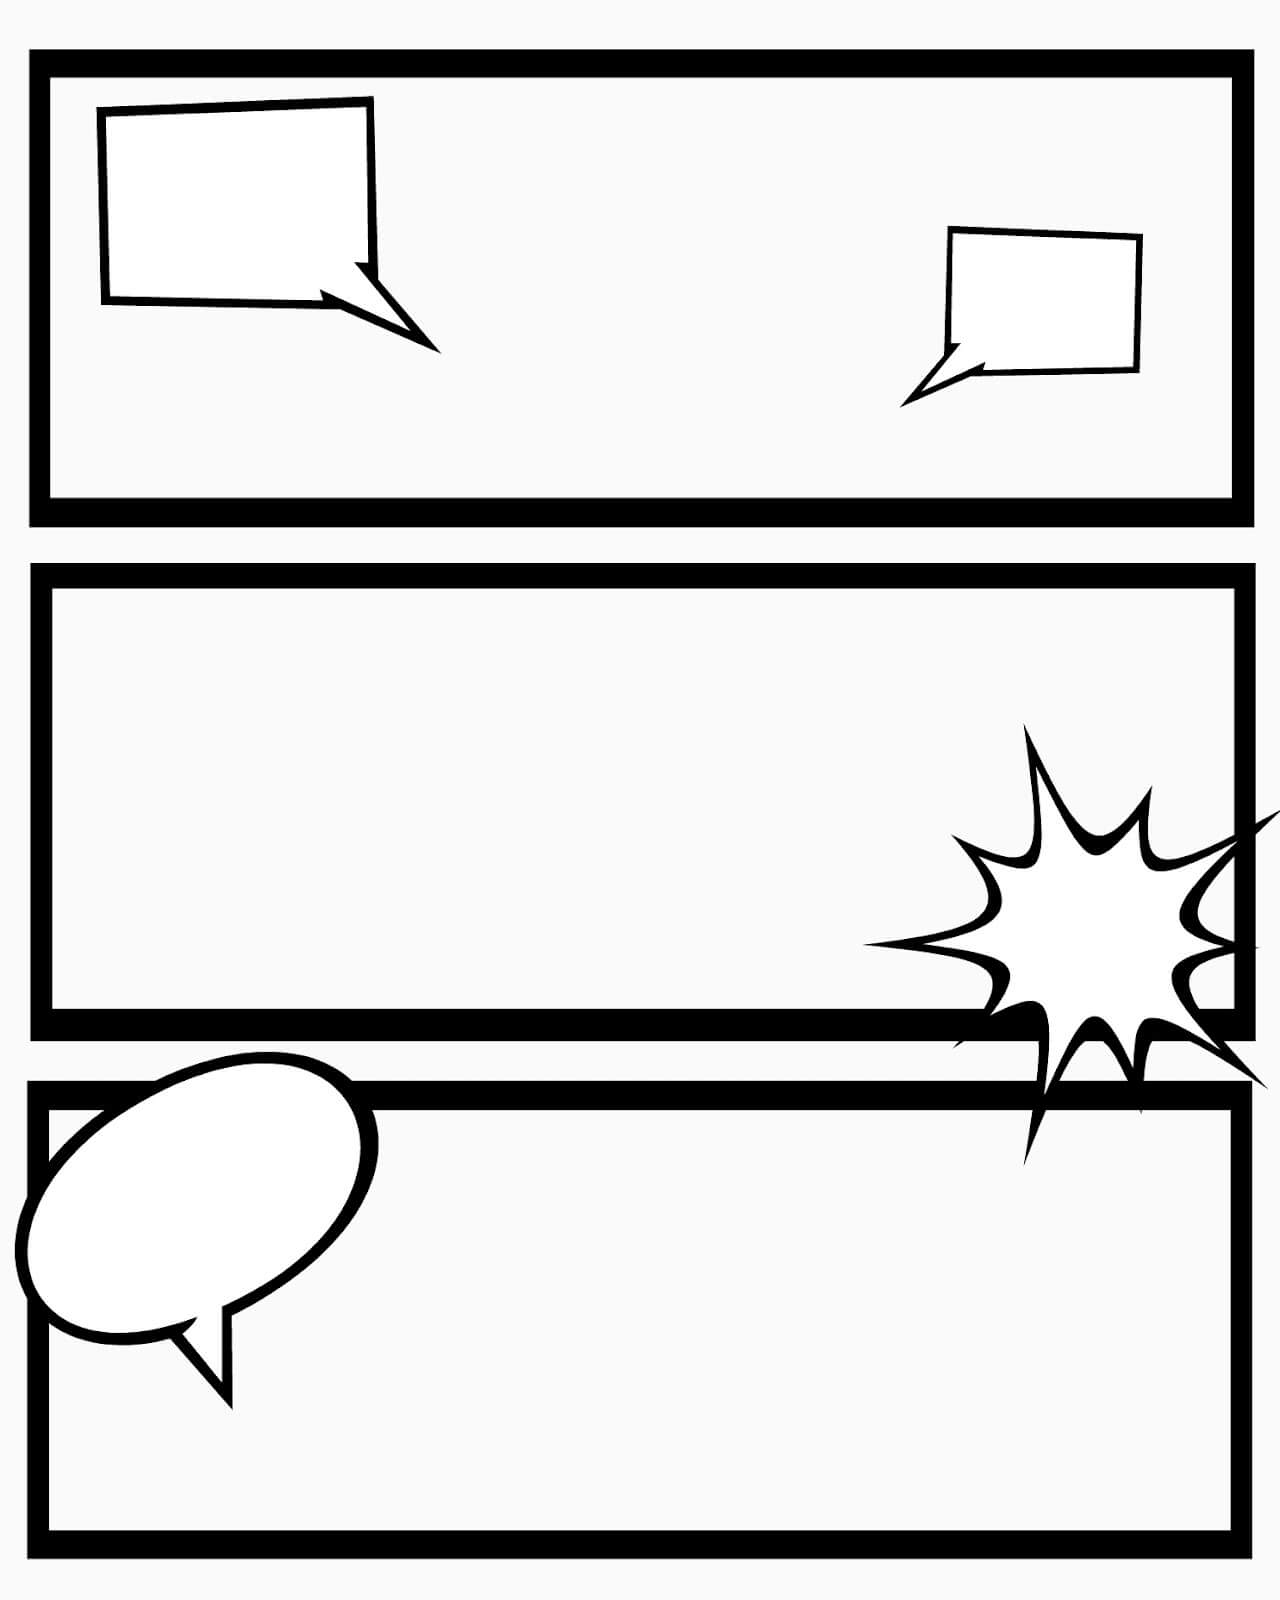 Free Comic Book Templates] Free Comic Book Templates For Printable Blank Comic Strip Template For Kids